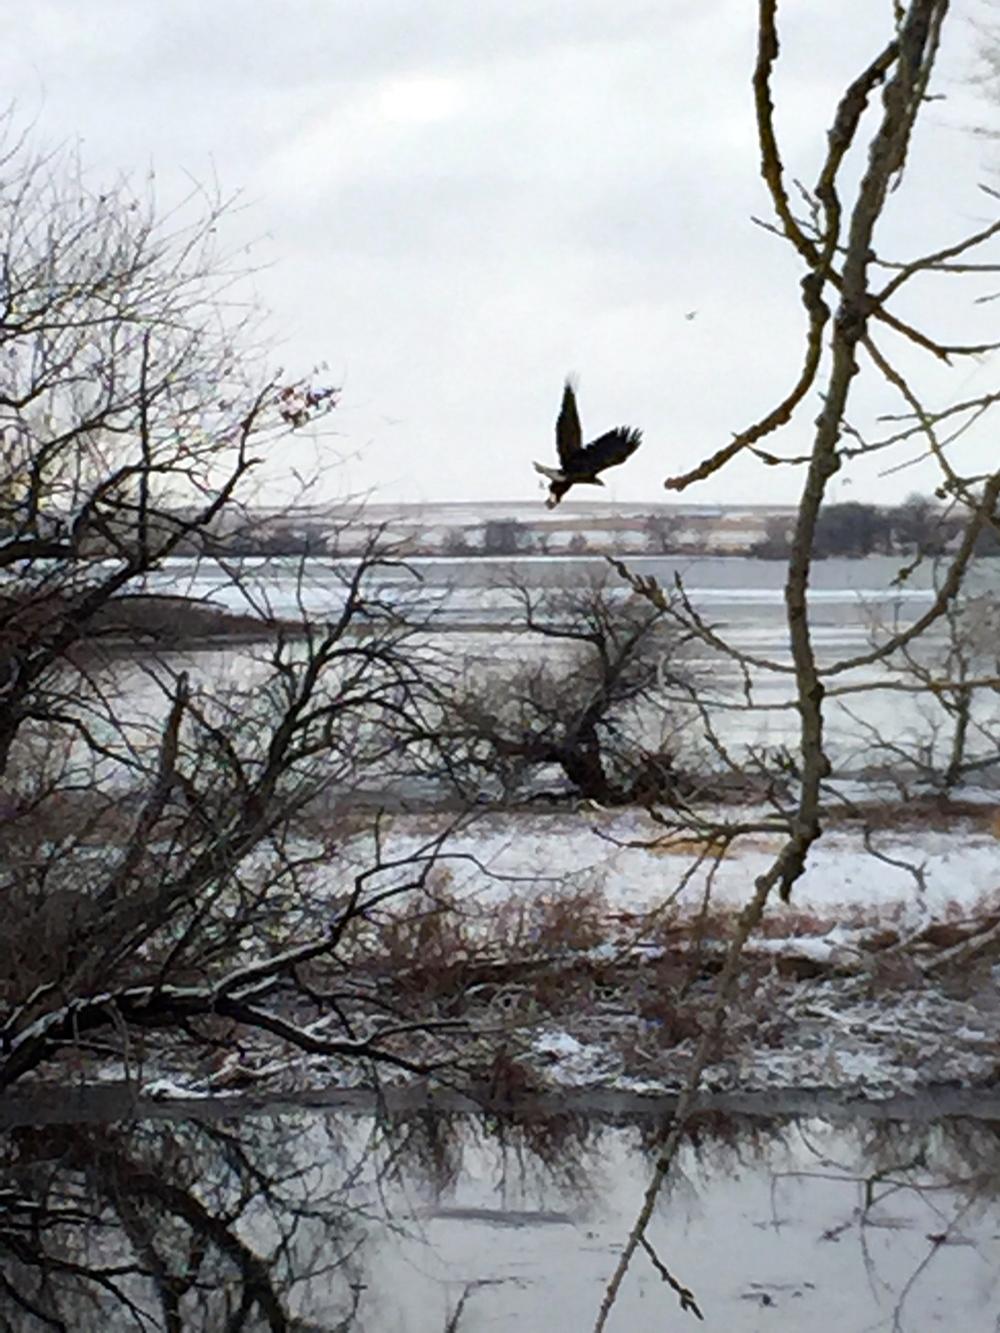 An eagle takes flight